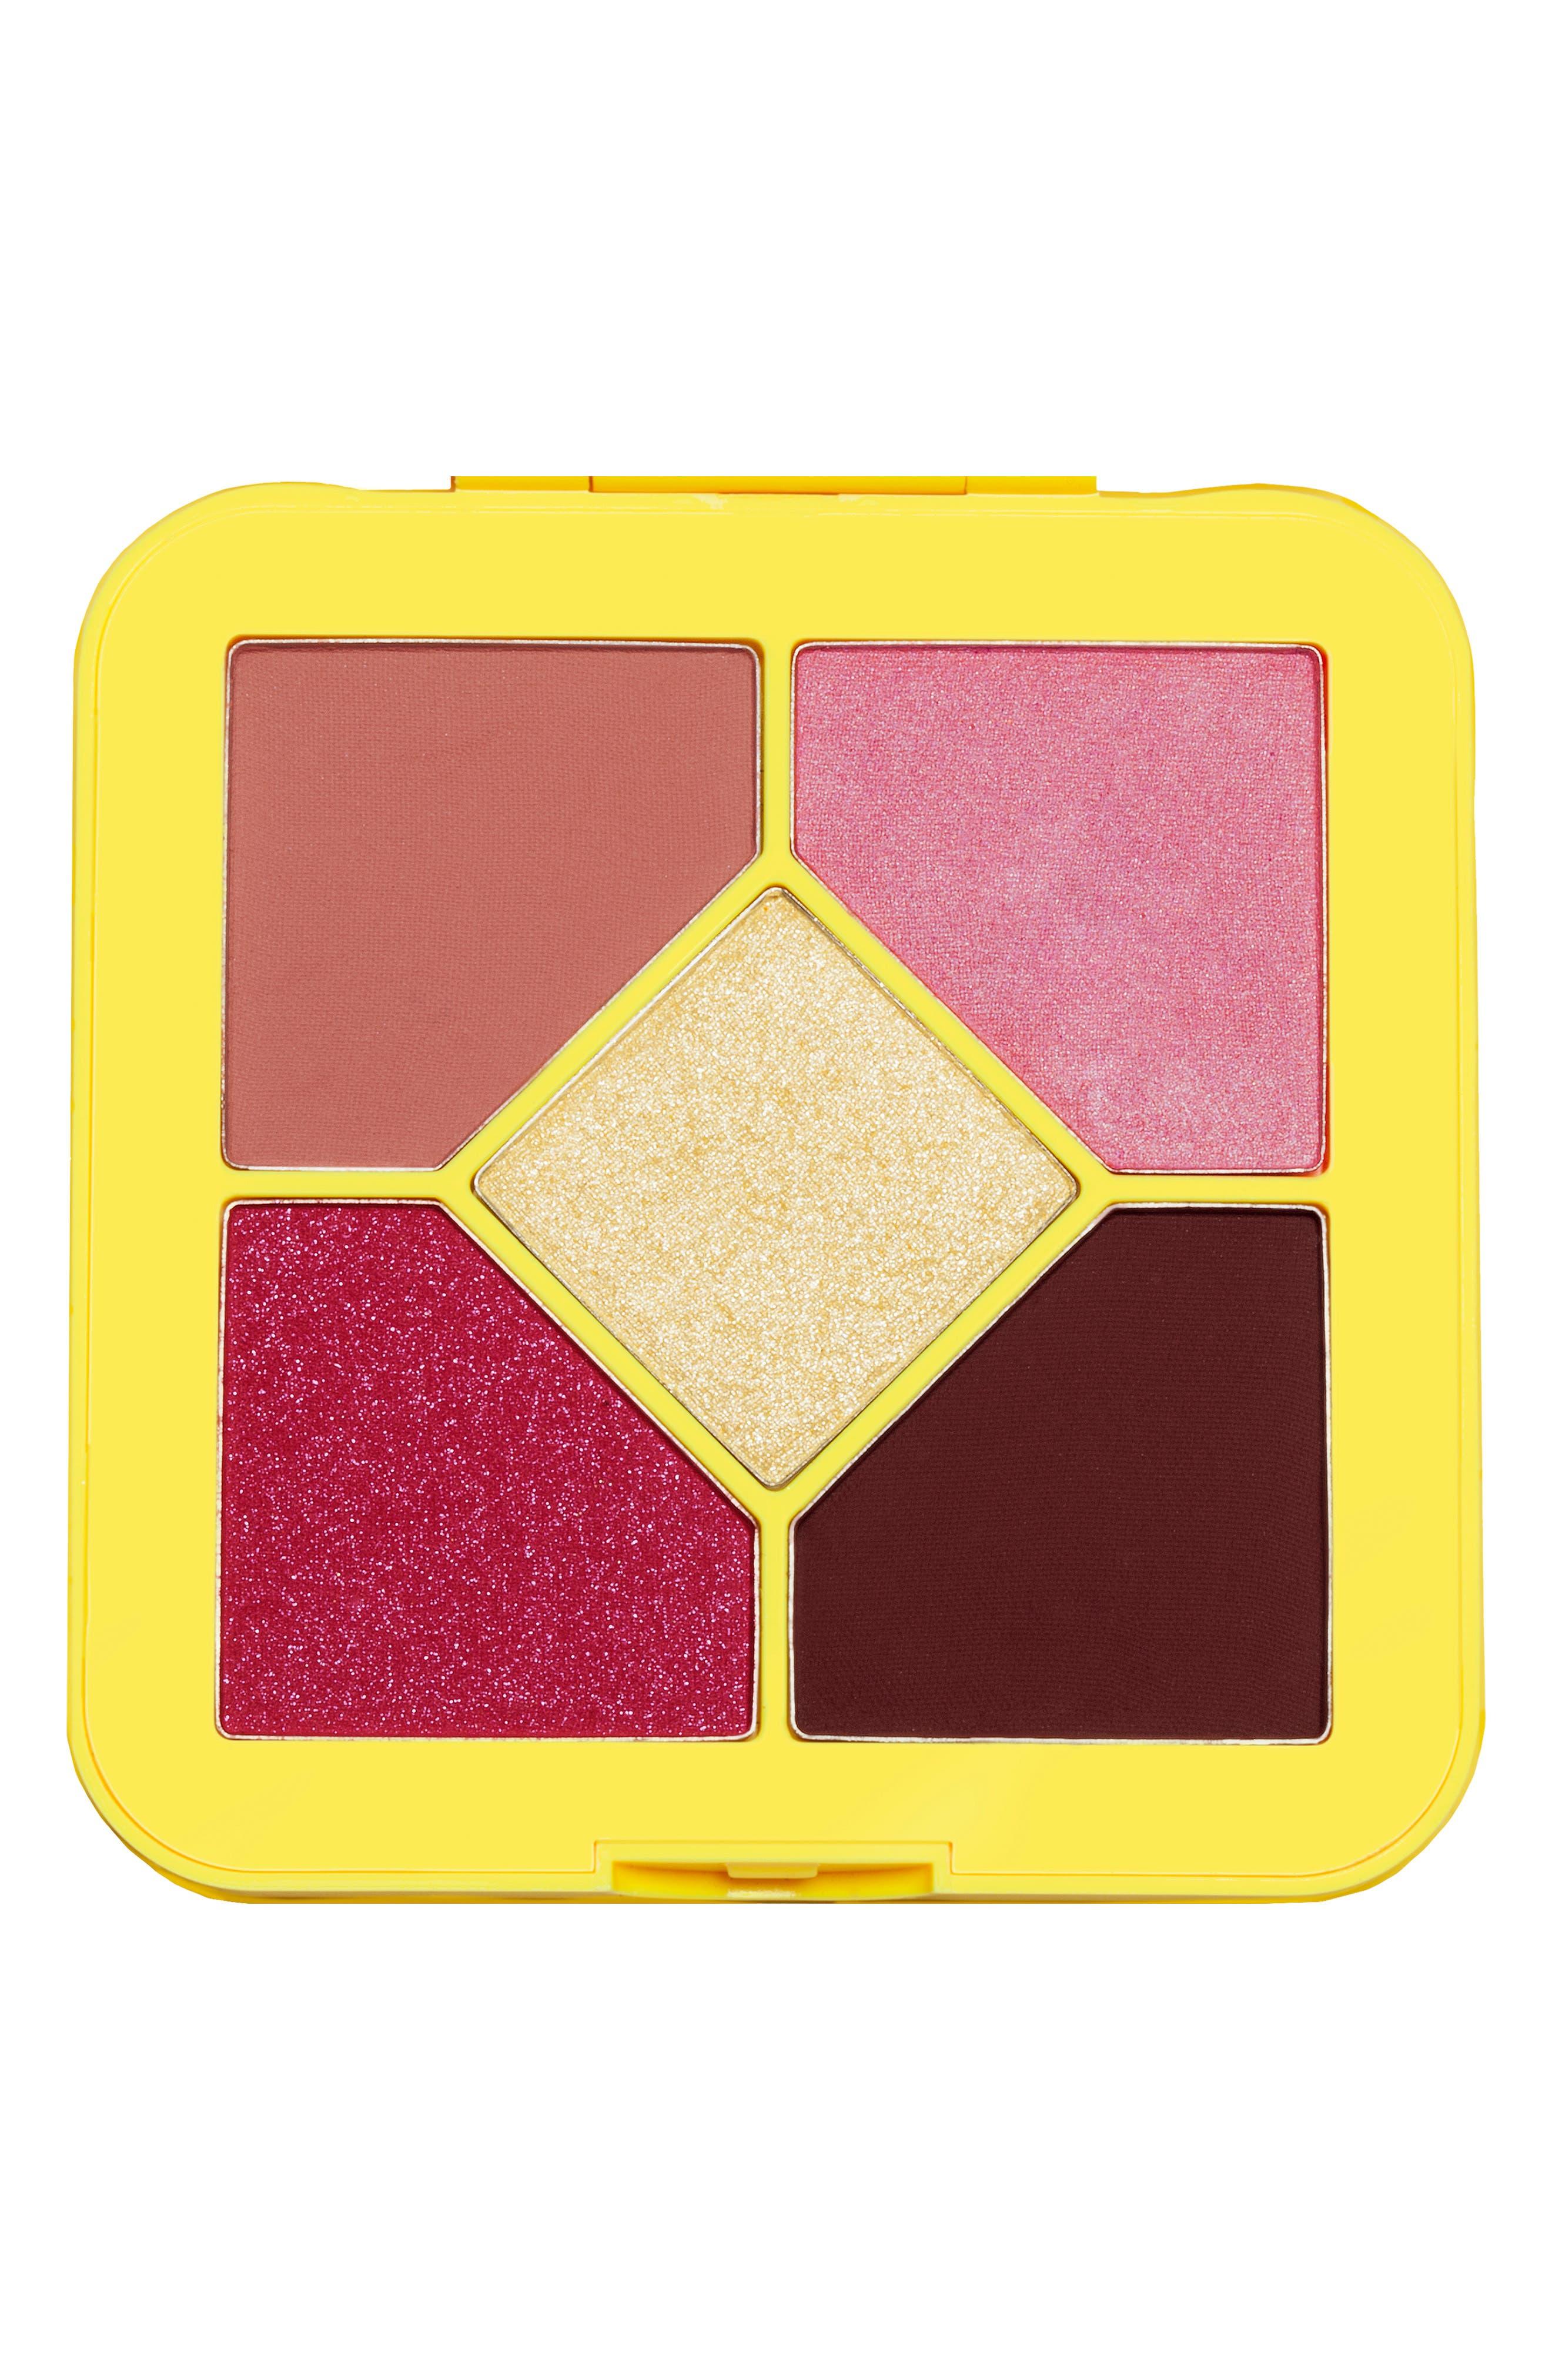 Pocket Candy Palette,                             Main thumbnail 1, color,                             PINK LEMONADE